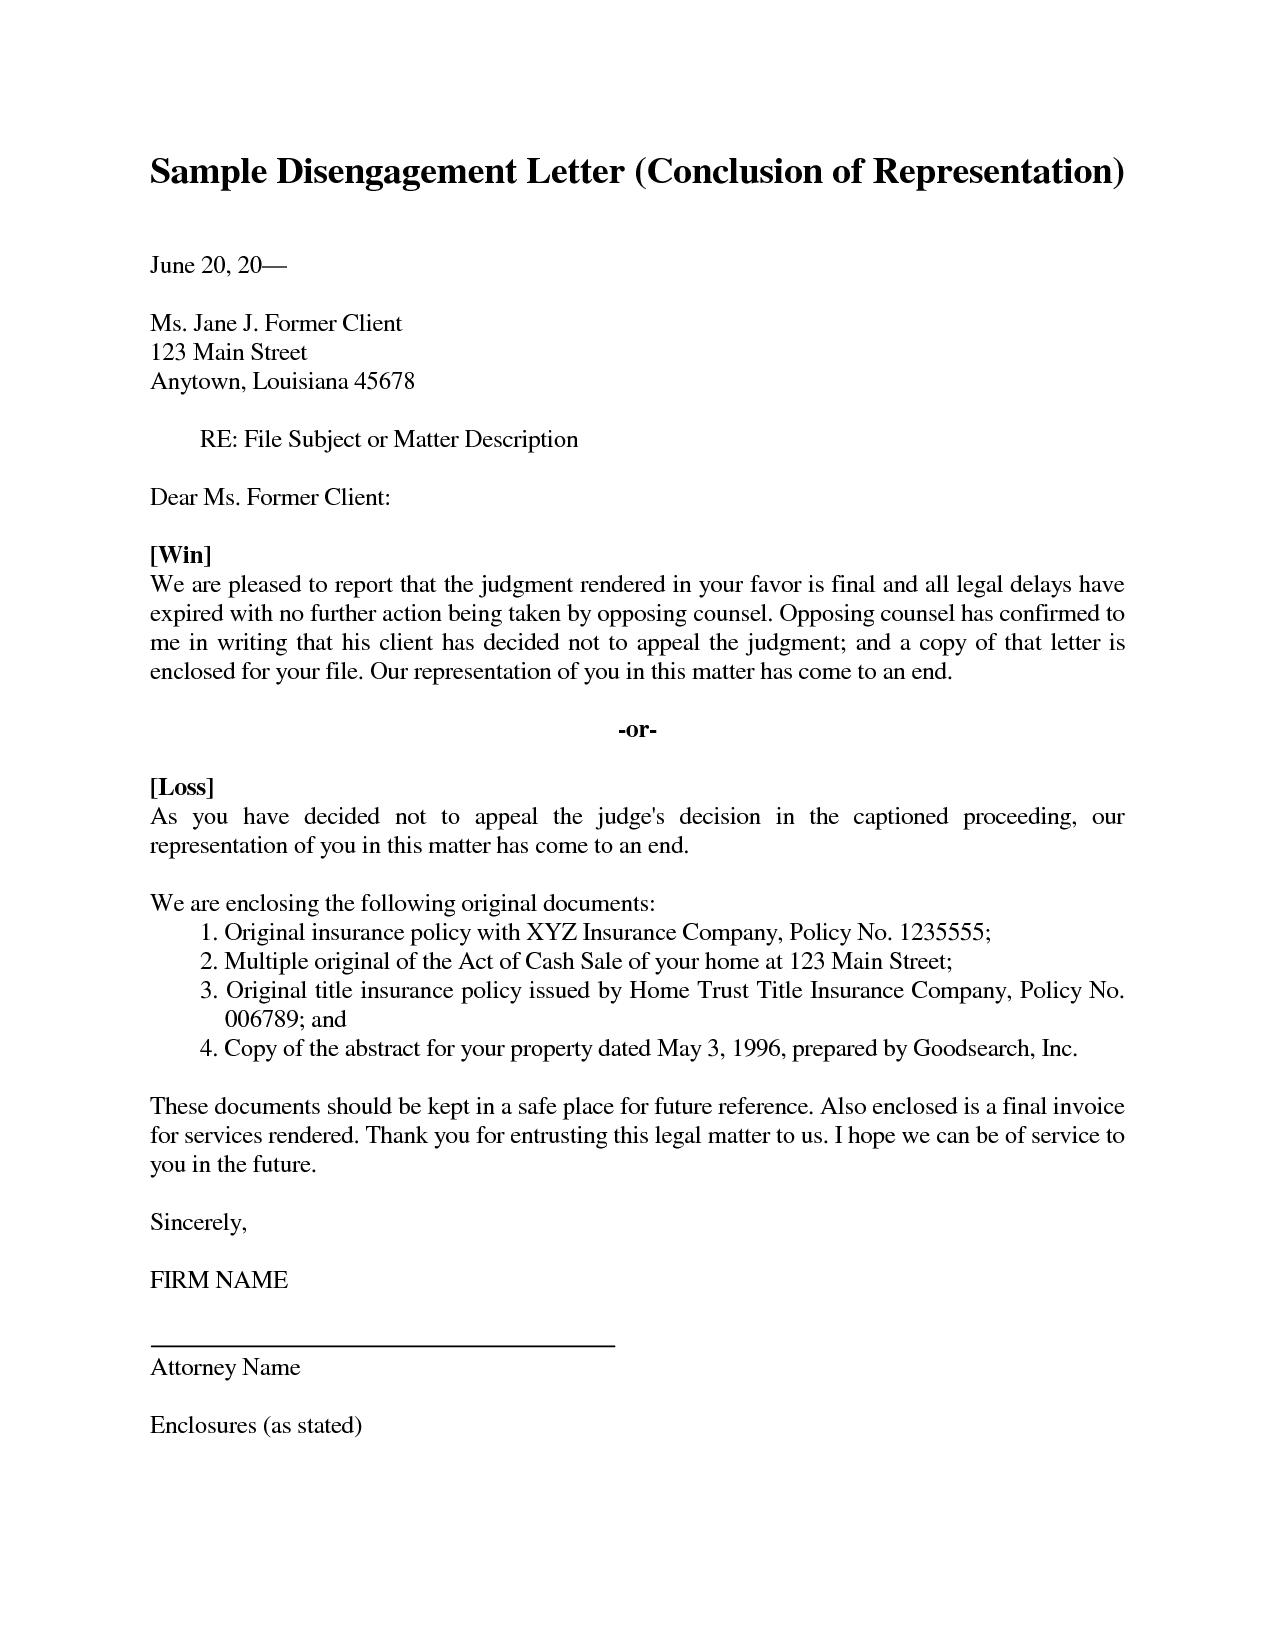 Sample Legal Representation Letter By Mlp